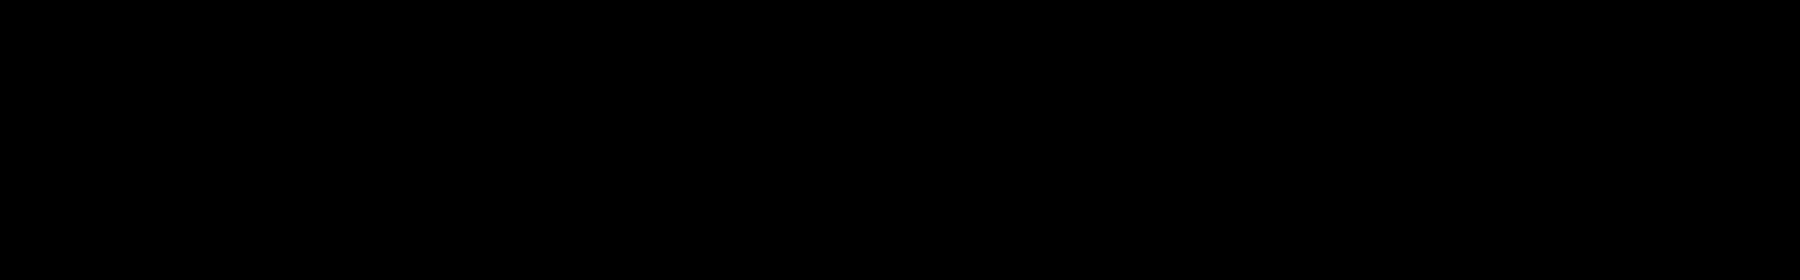 Unorthodox Trap audio waveform